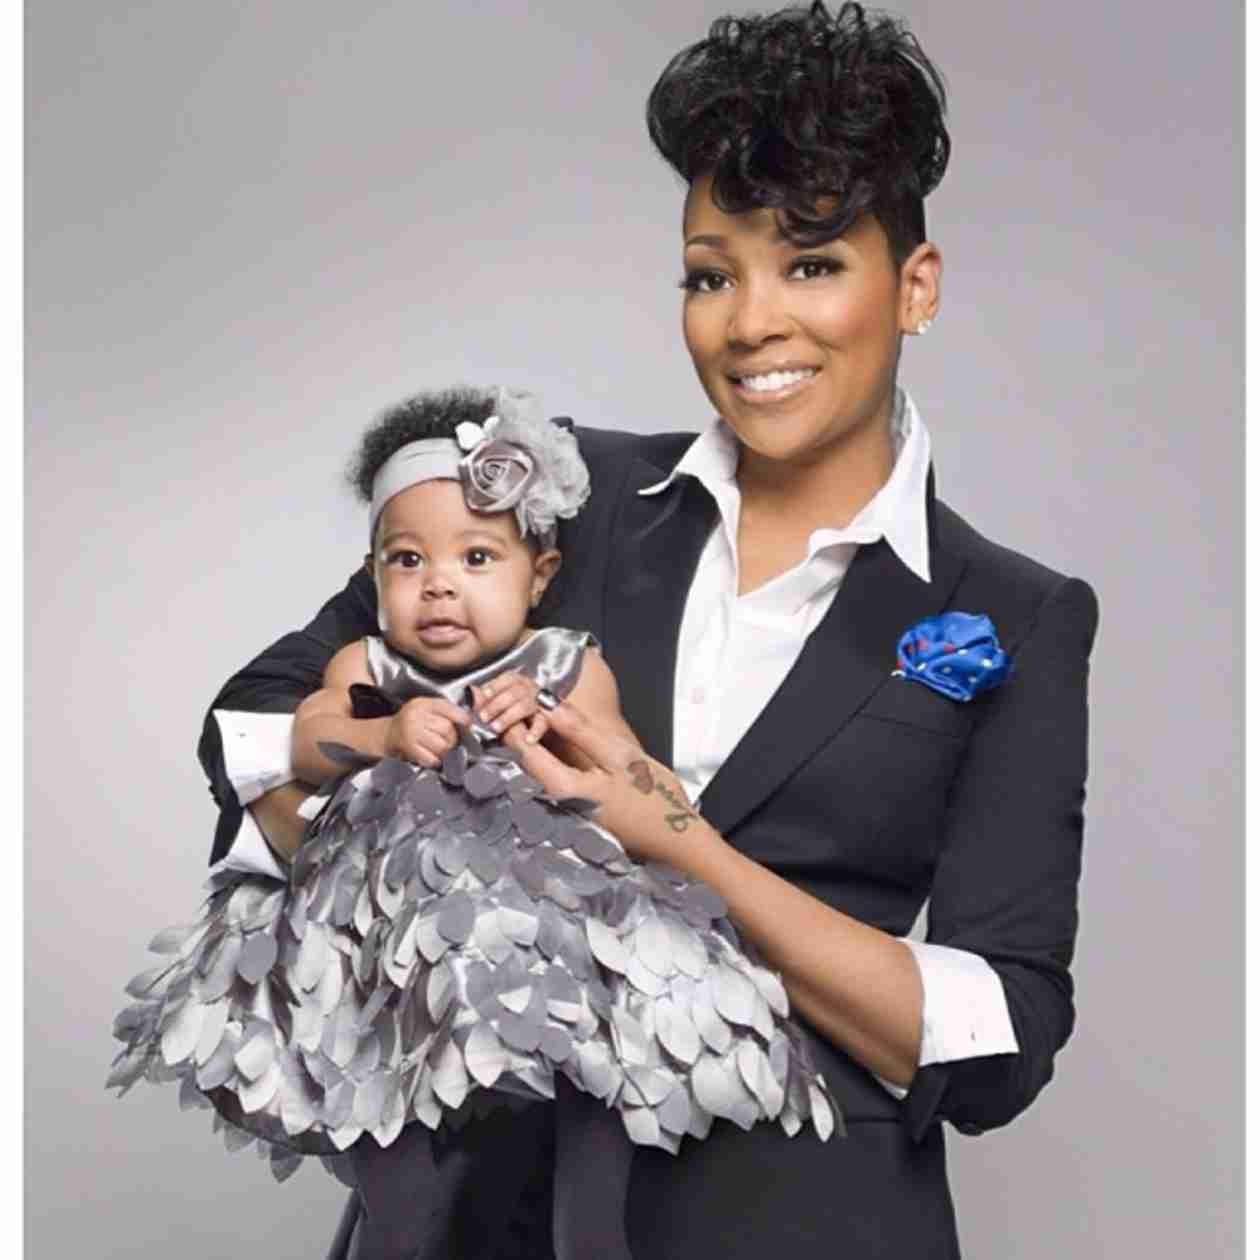 Monica's Daughter Laiyah Reaches Major Milestone ! (VIDEO)